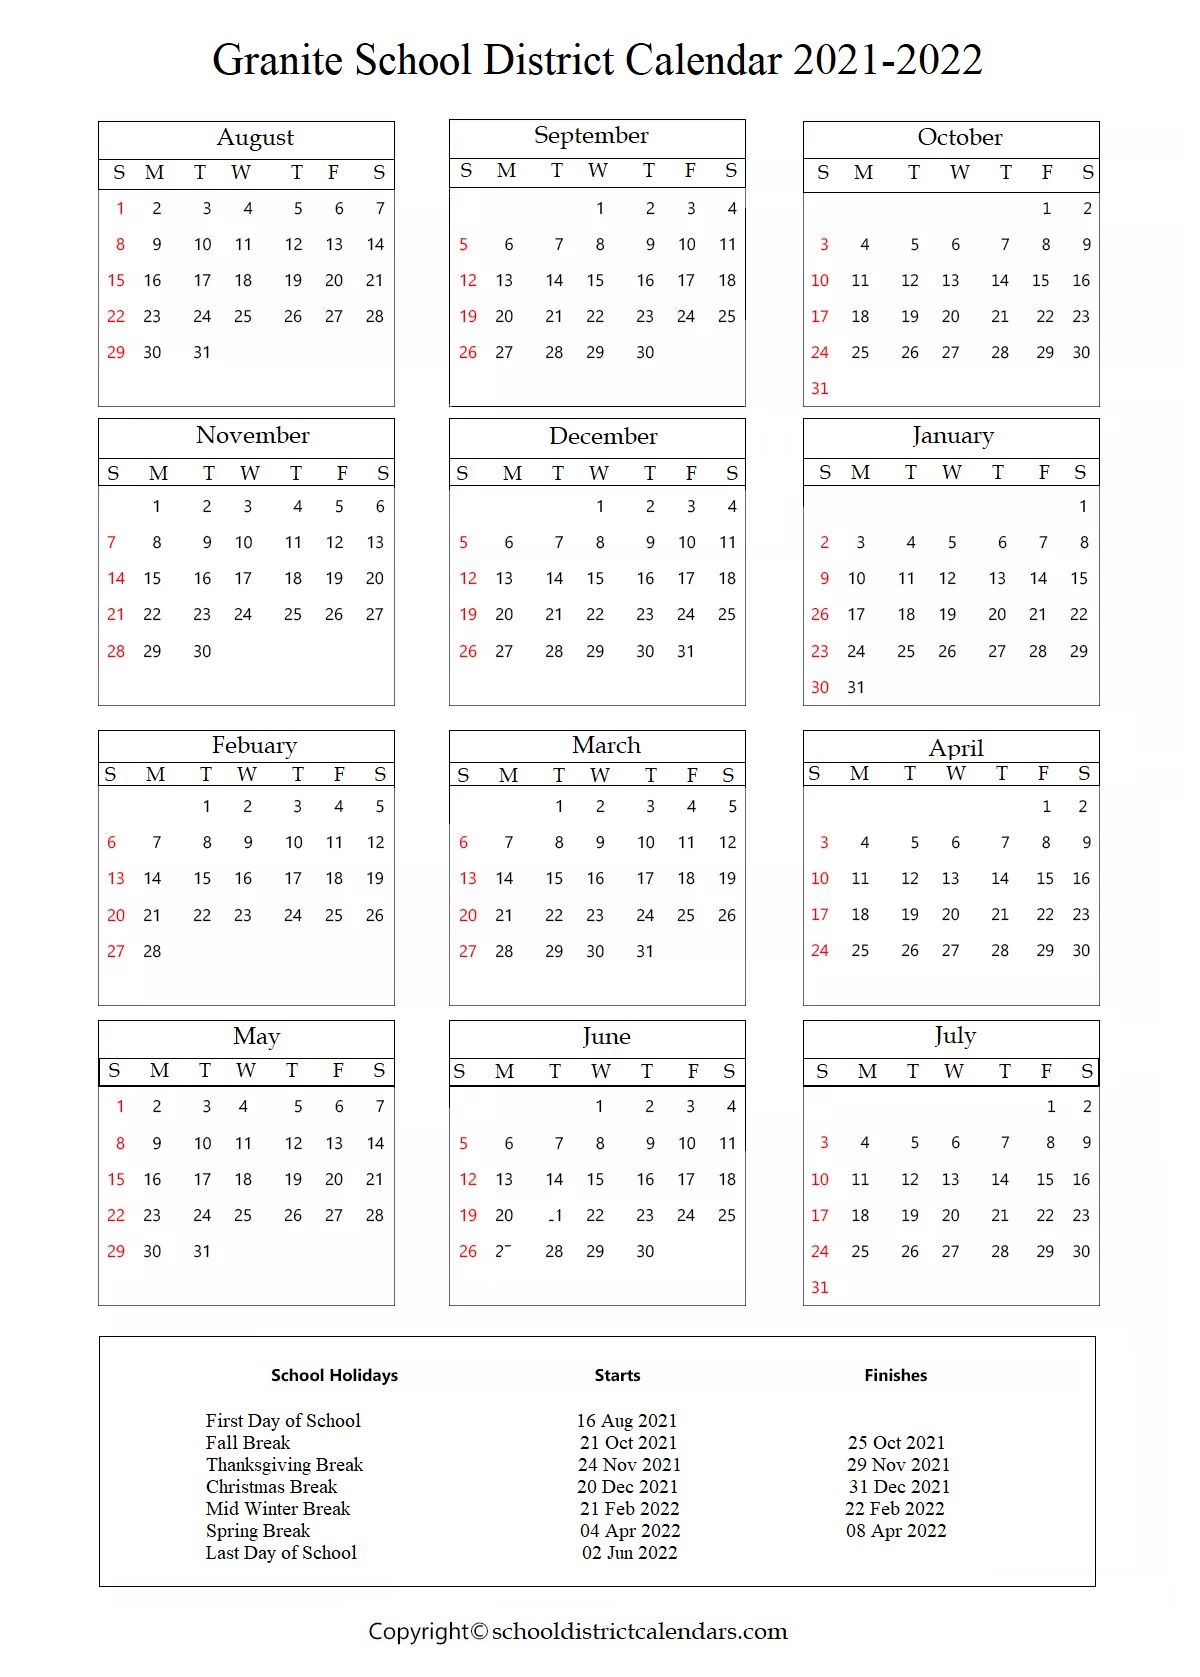 Granite School District Calendar Holidays 2021-2022